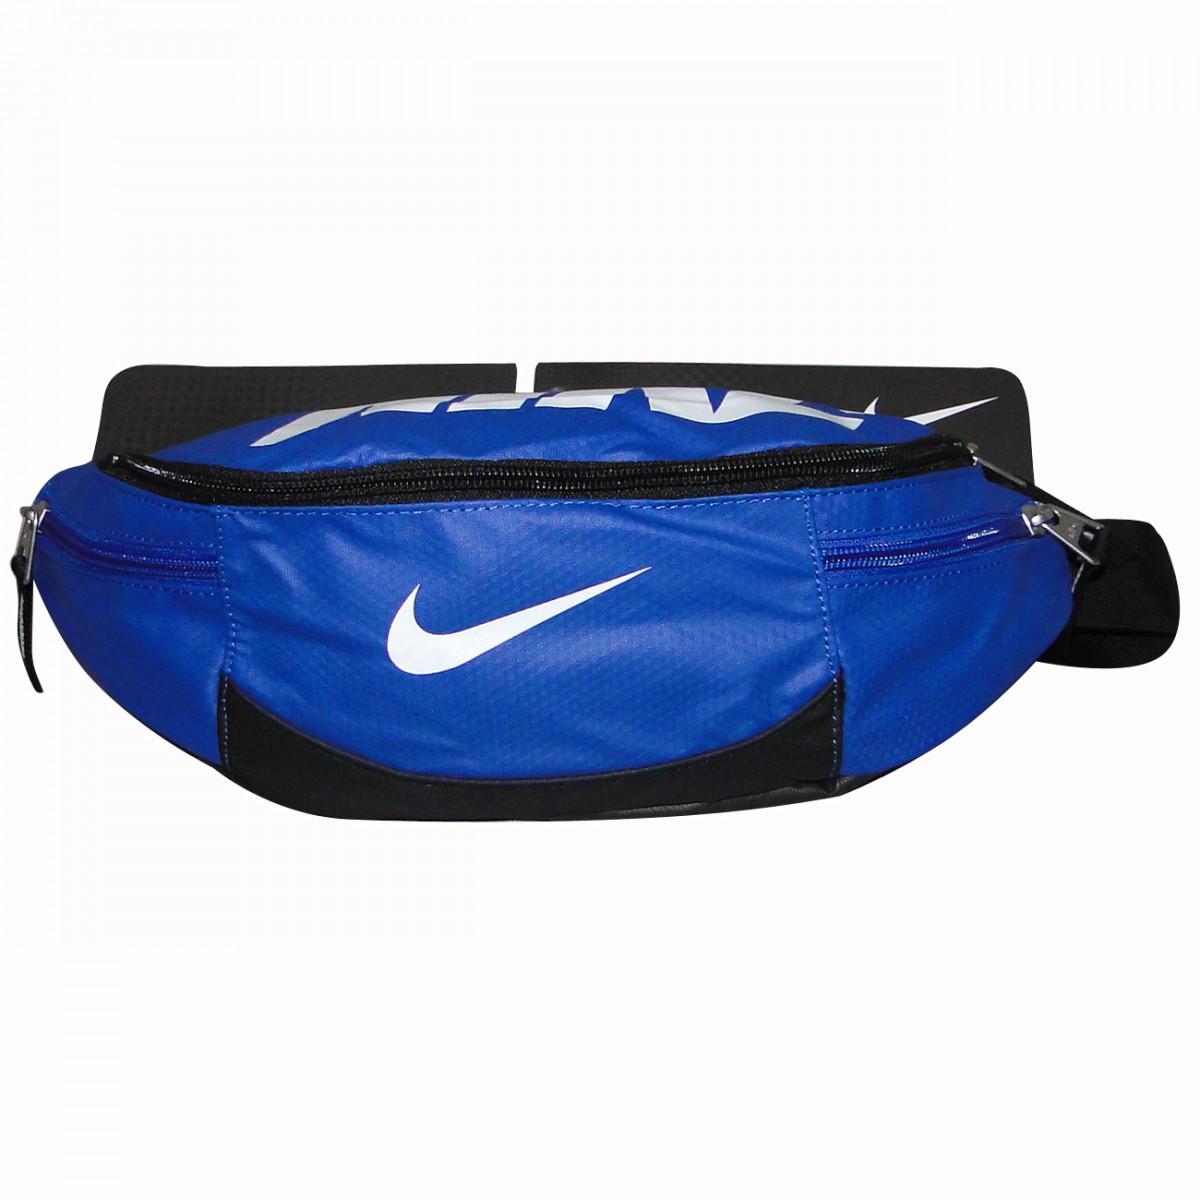 c42f53a8e Pochete Nike ref.4601 4601-041 - Azul/Branco - Chuteira Nike, Adidas ...